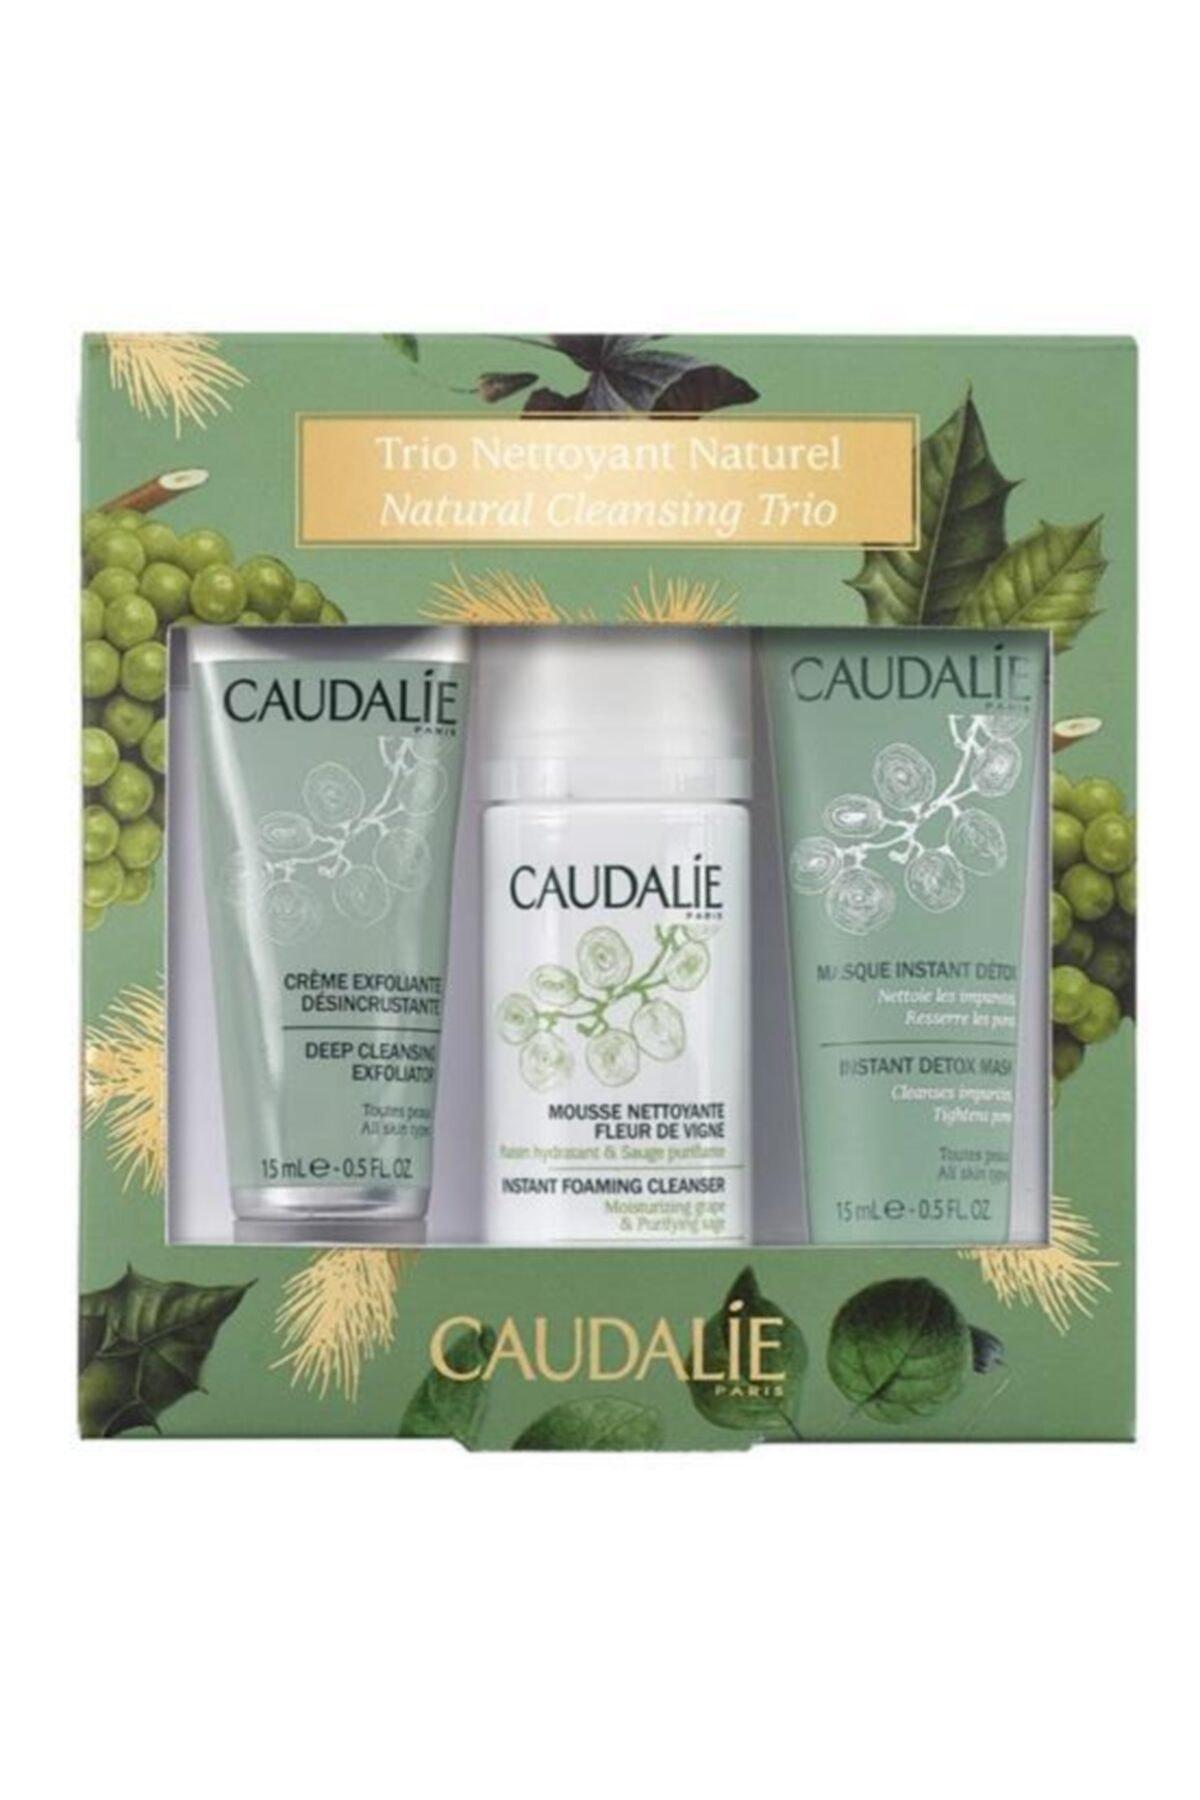 Caudalie Cleansing Trio Set - Yoğun Peeling & Temizleme Köpüğü & Detoks Etkili Maske 3522930026846 1